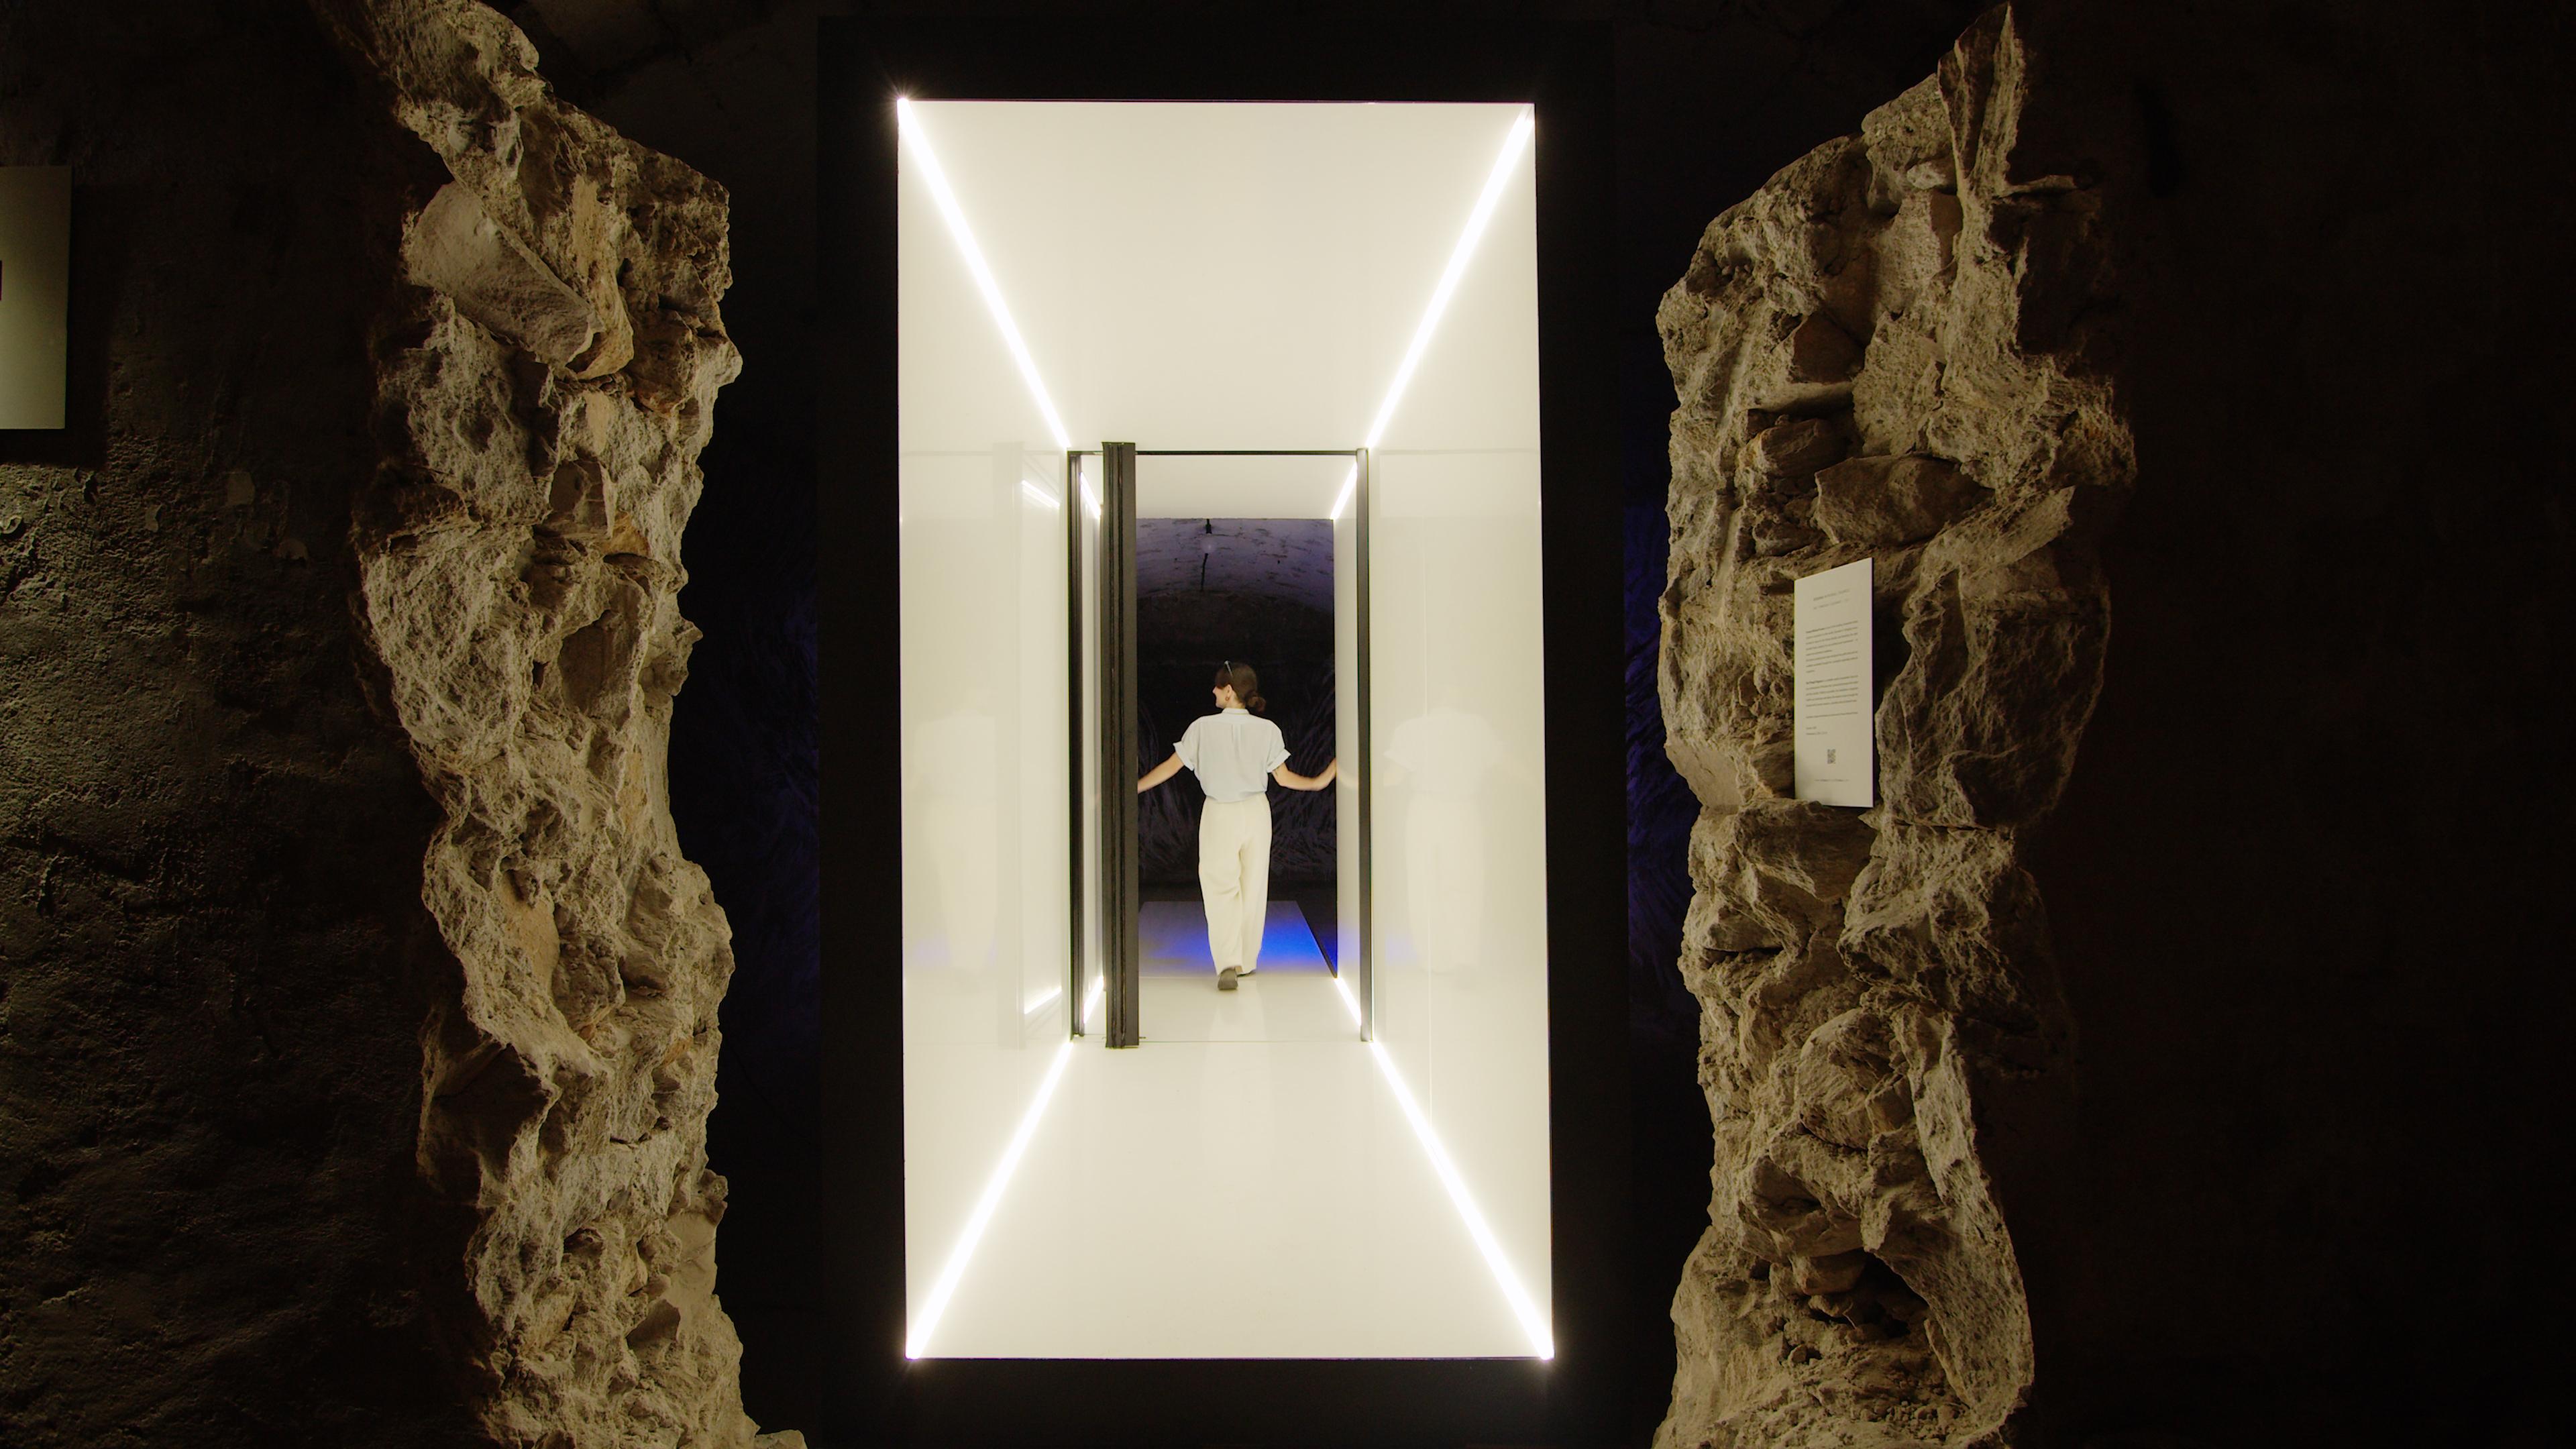 Exhibition – Milos: Approaching alternative architectural landscapes